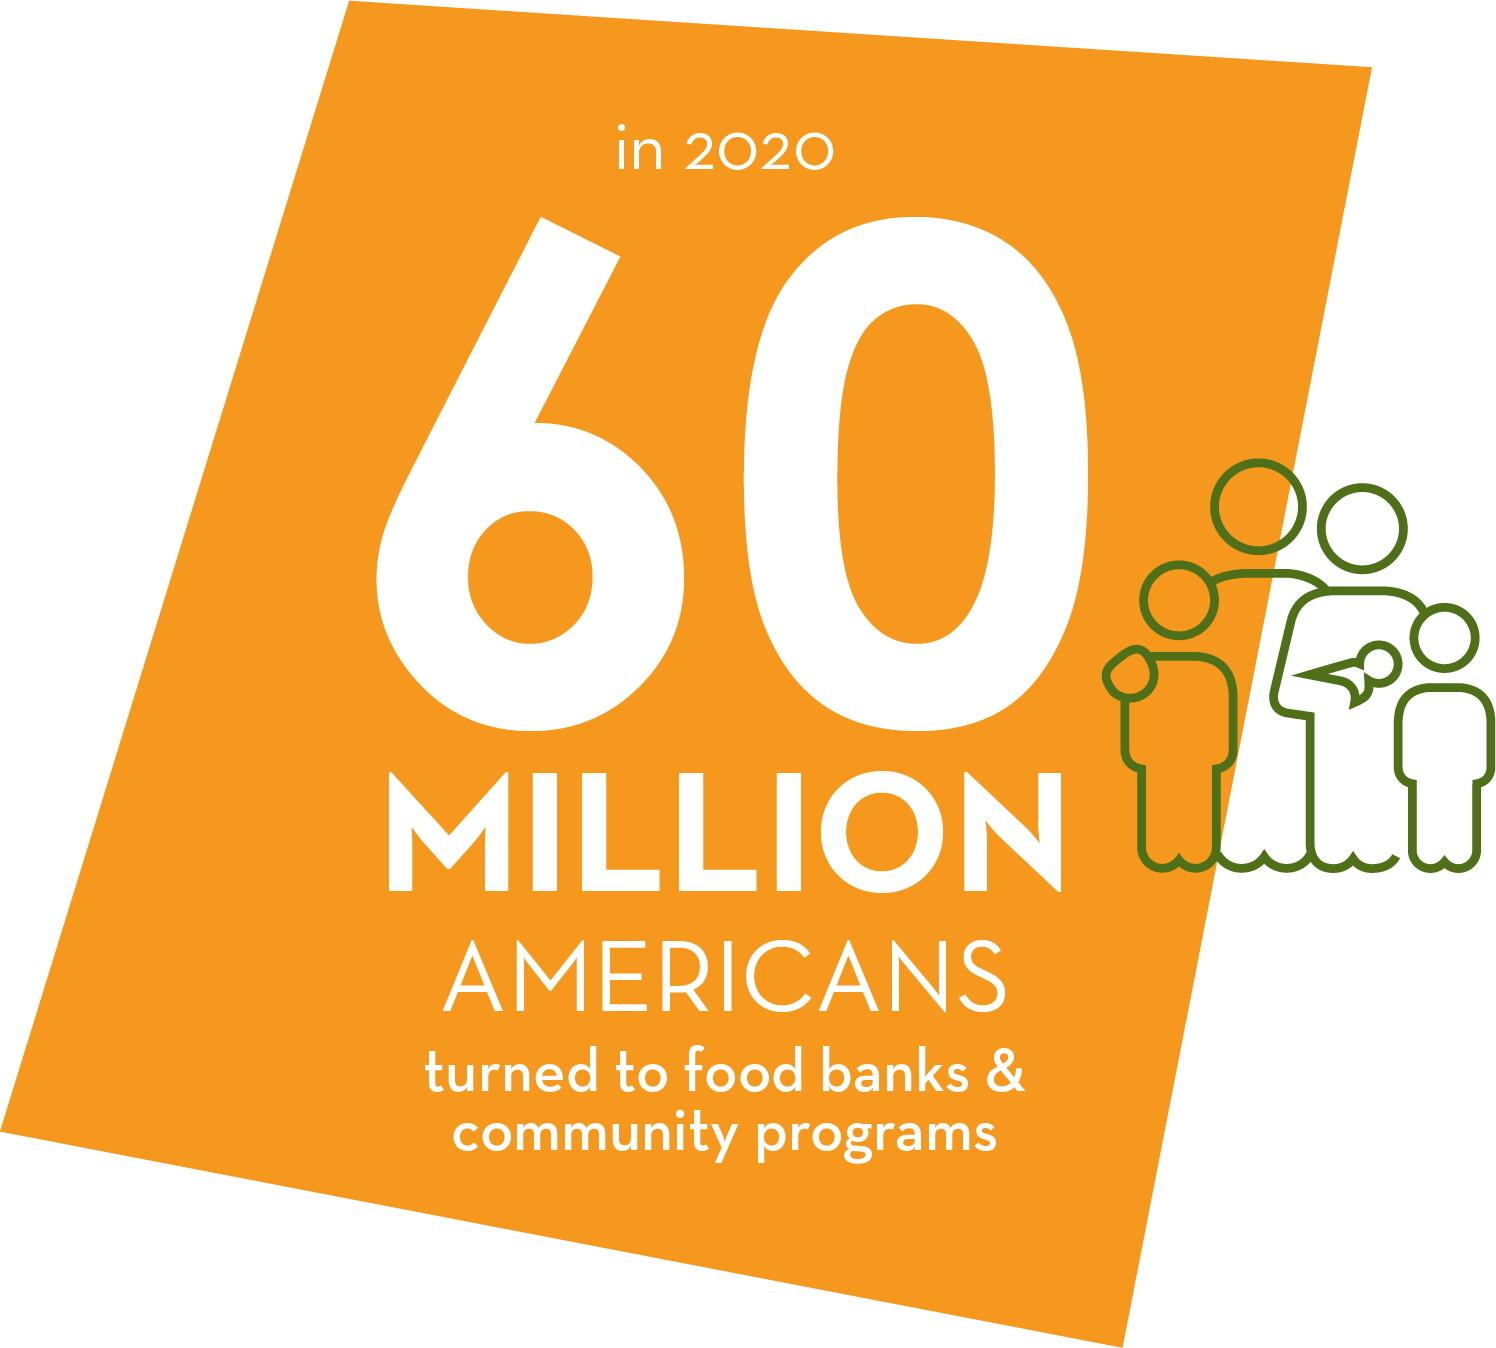 60 Million Americans